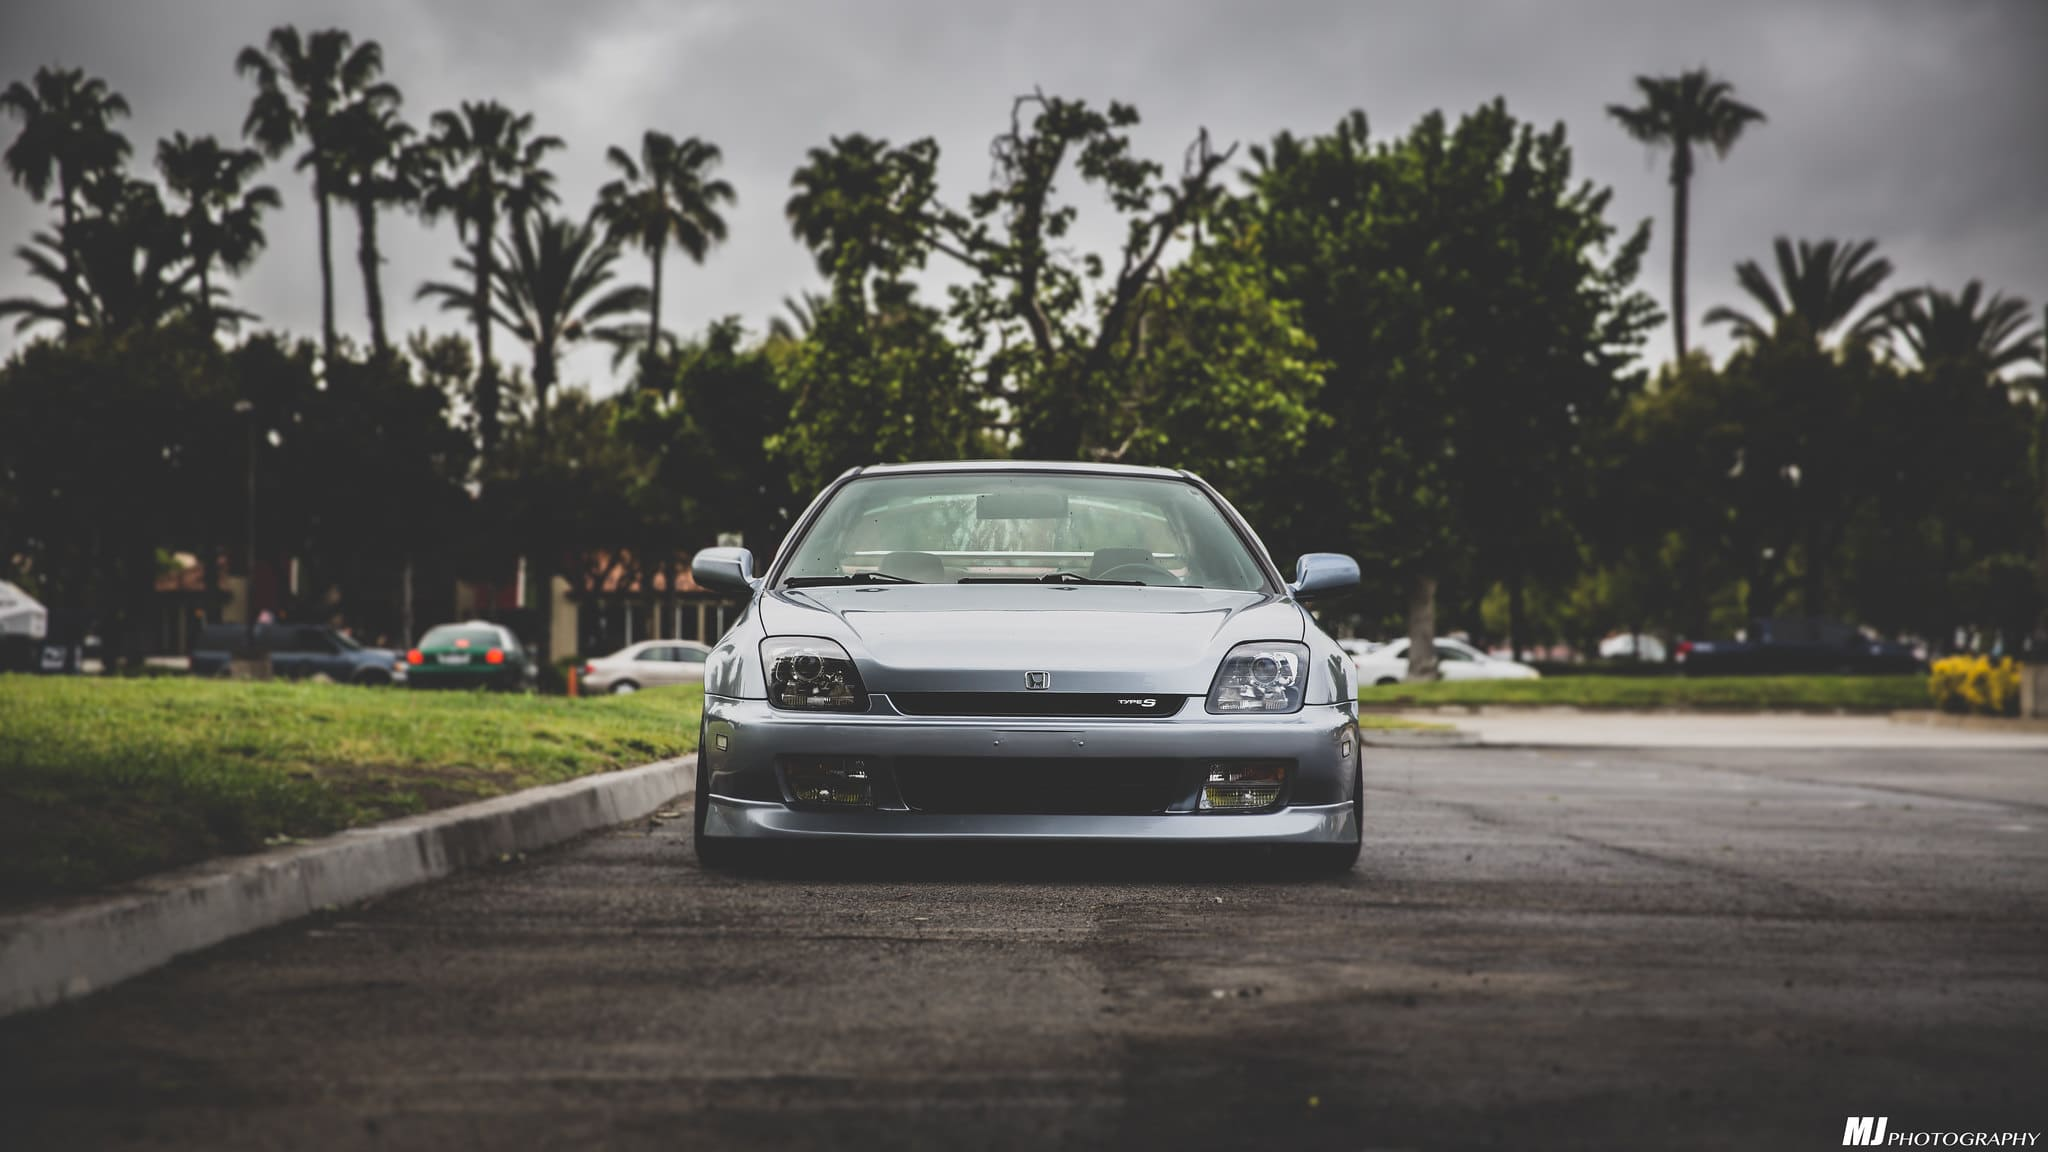 1999 Honda Prelude SH Front End